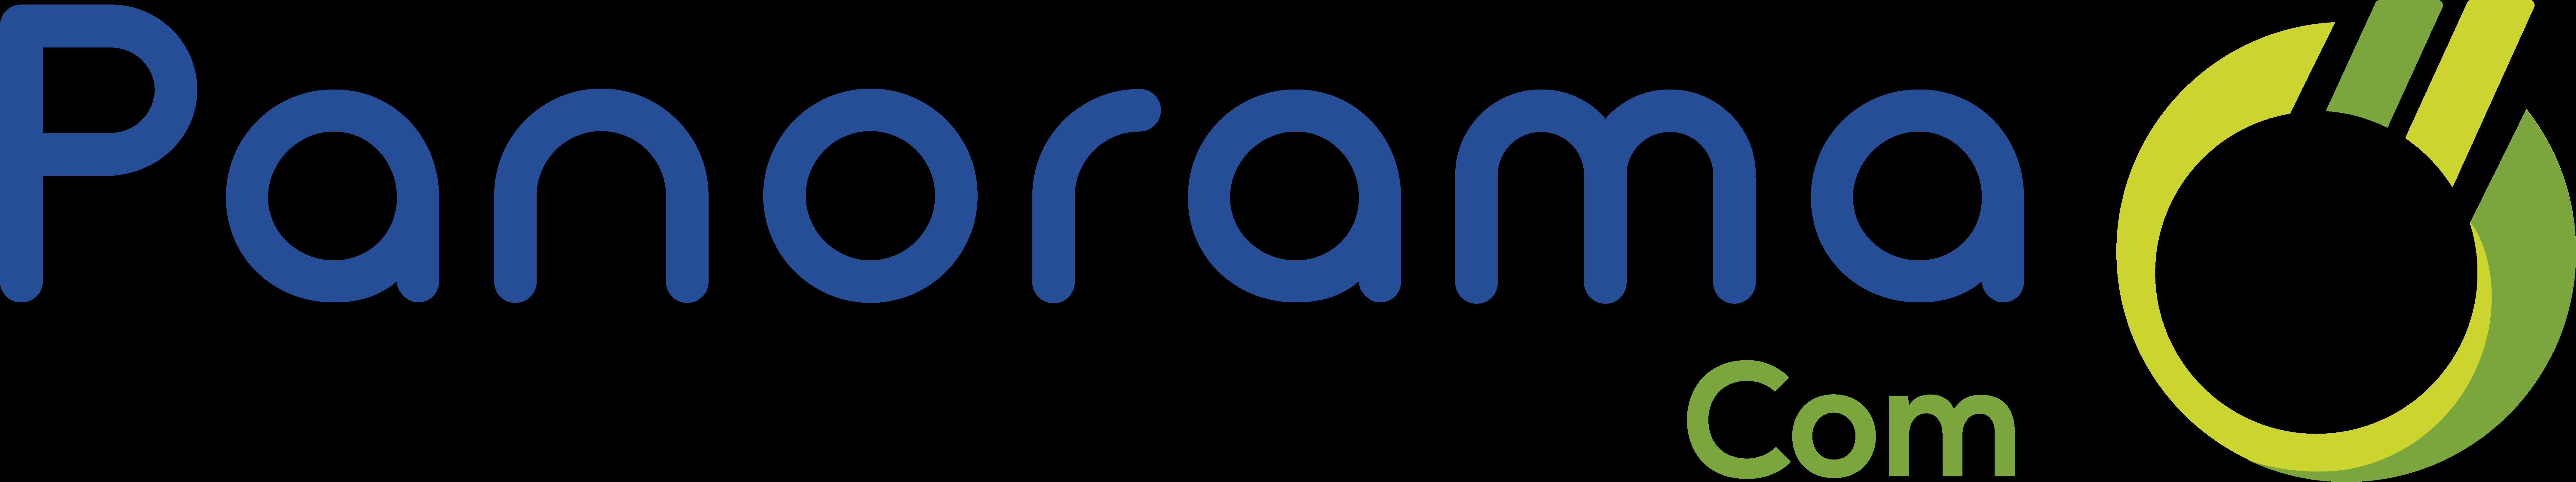 Panorama COM